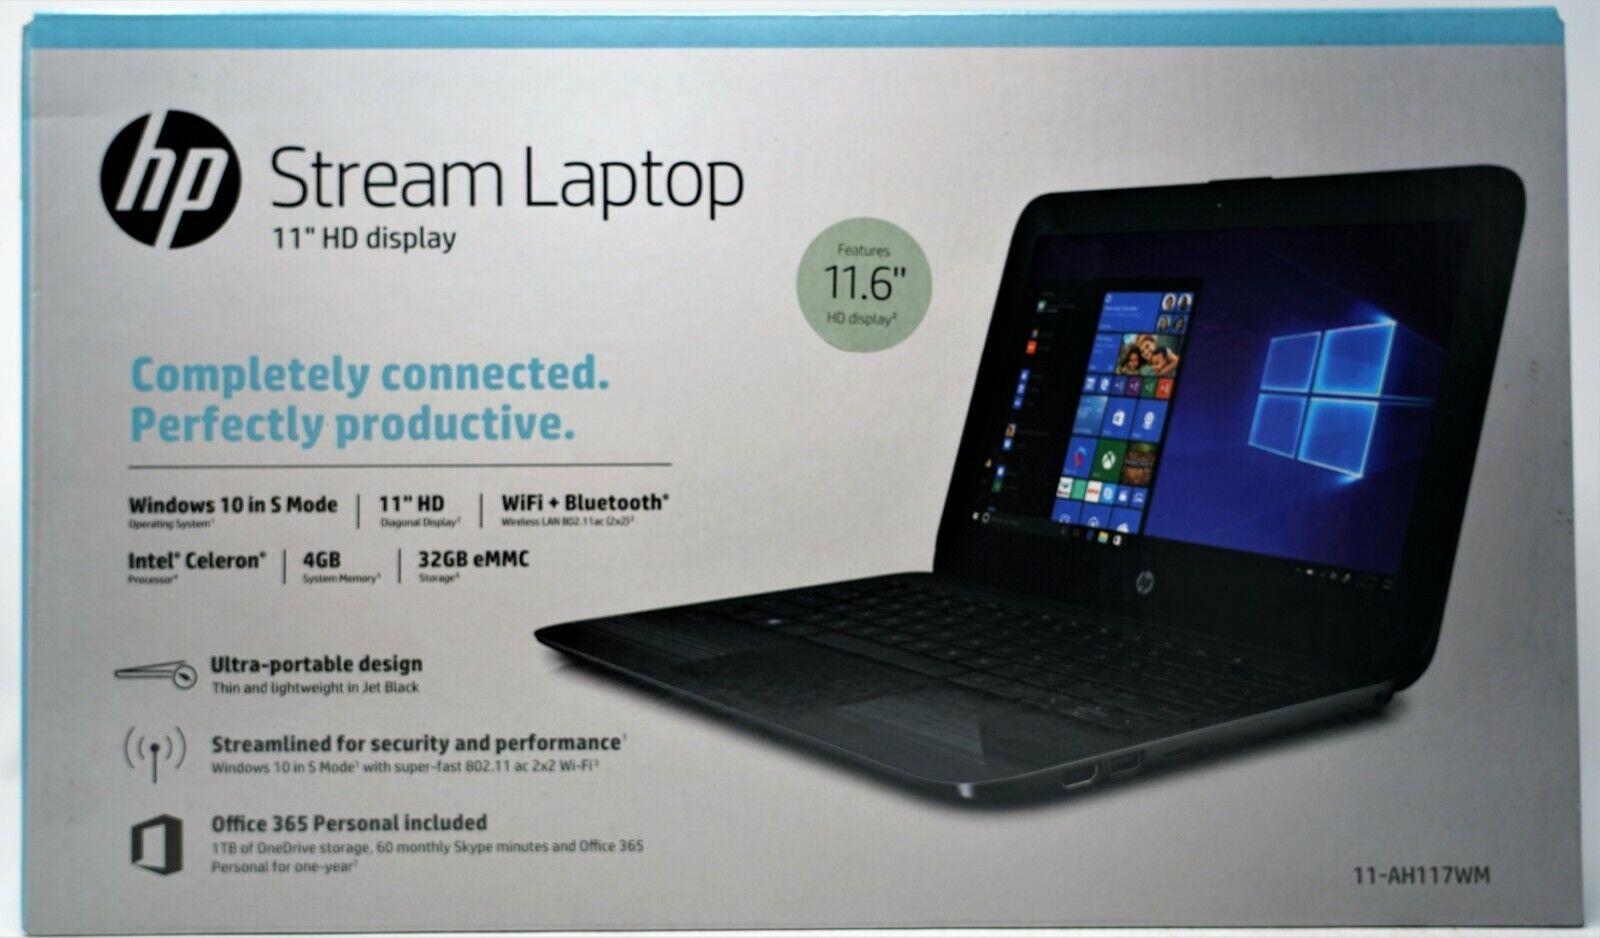 "Laptop Windows - NEW HP 11-ah117wm Streambook 11.6"" HD N4000 4GB RAM 32GB eMMC Windows 10 Black"